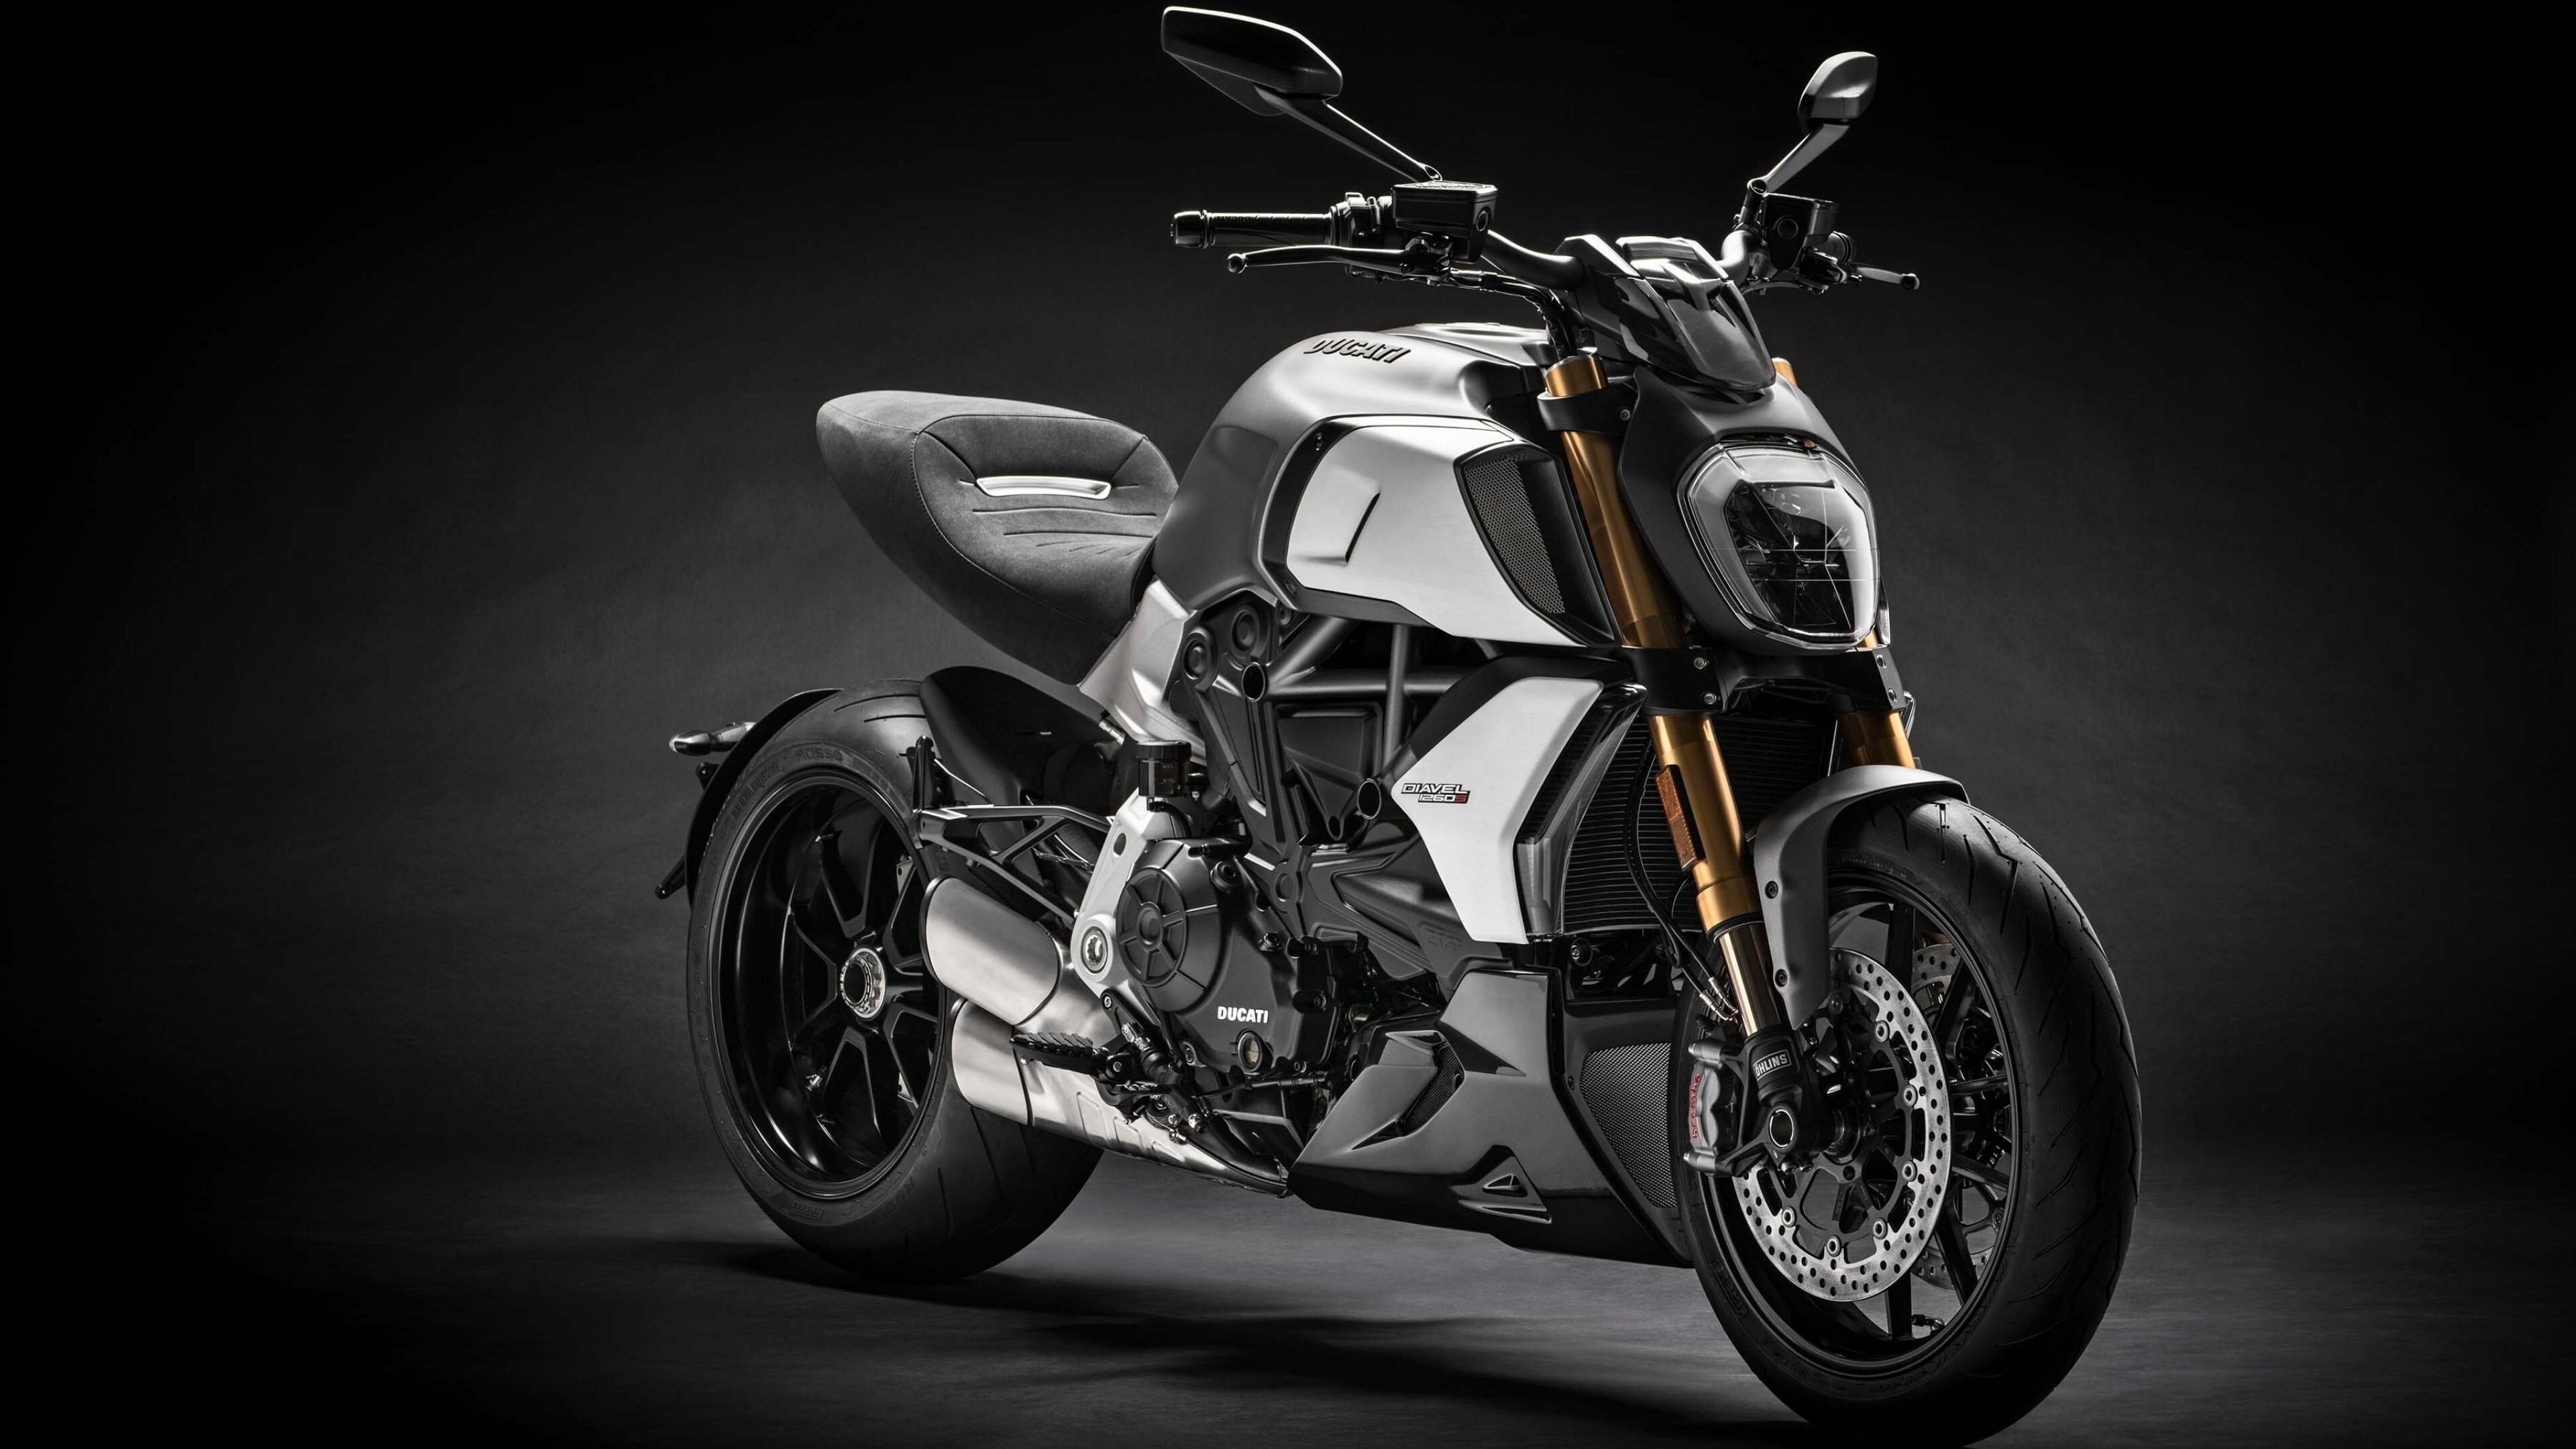 4K Wallpaper Of 2019 Ducati Diavel 1260 S Bike